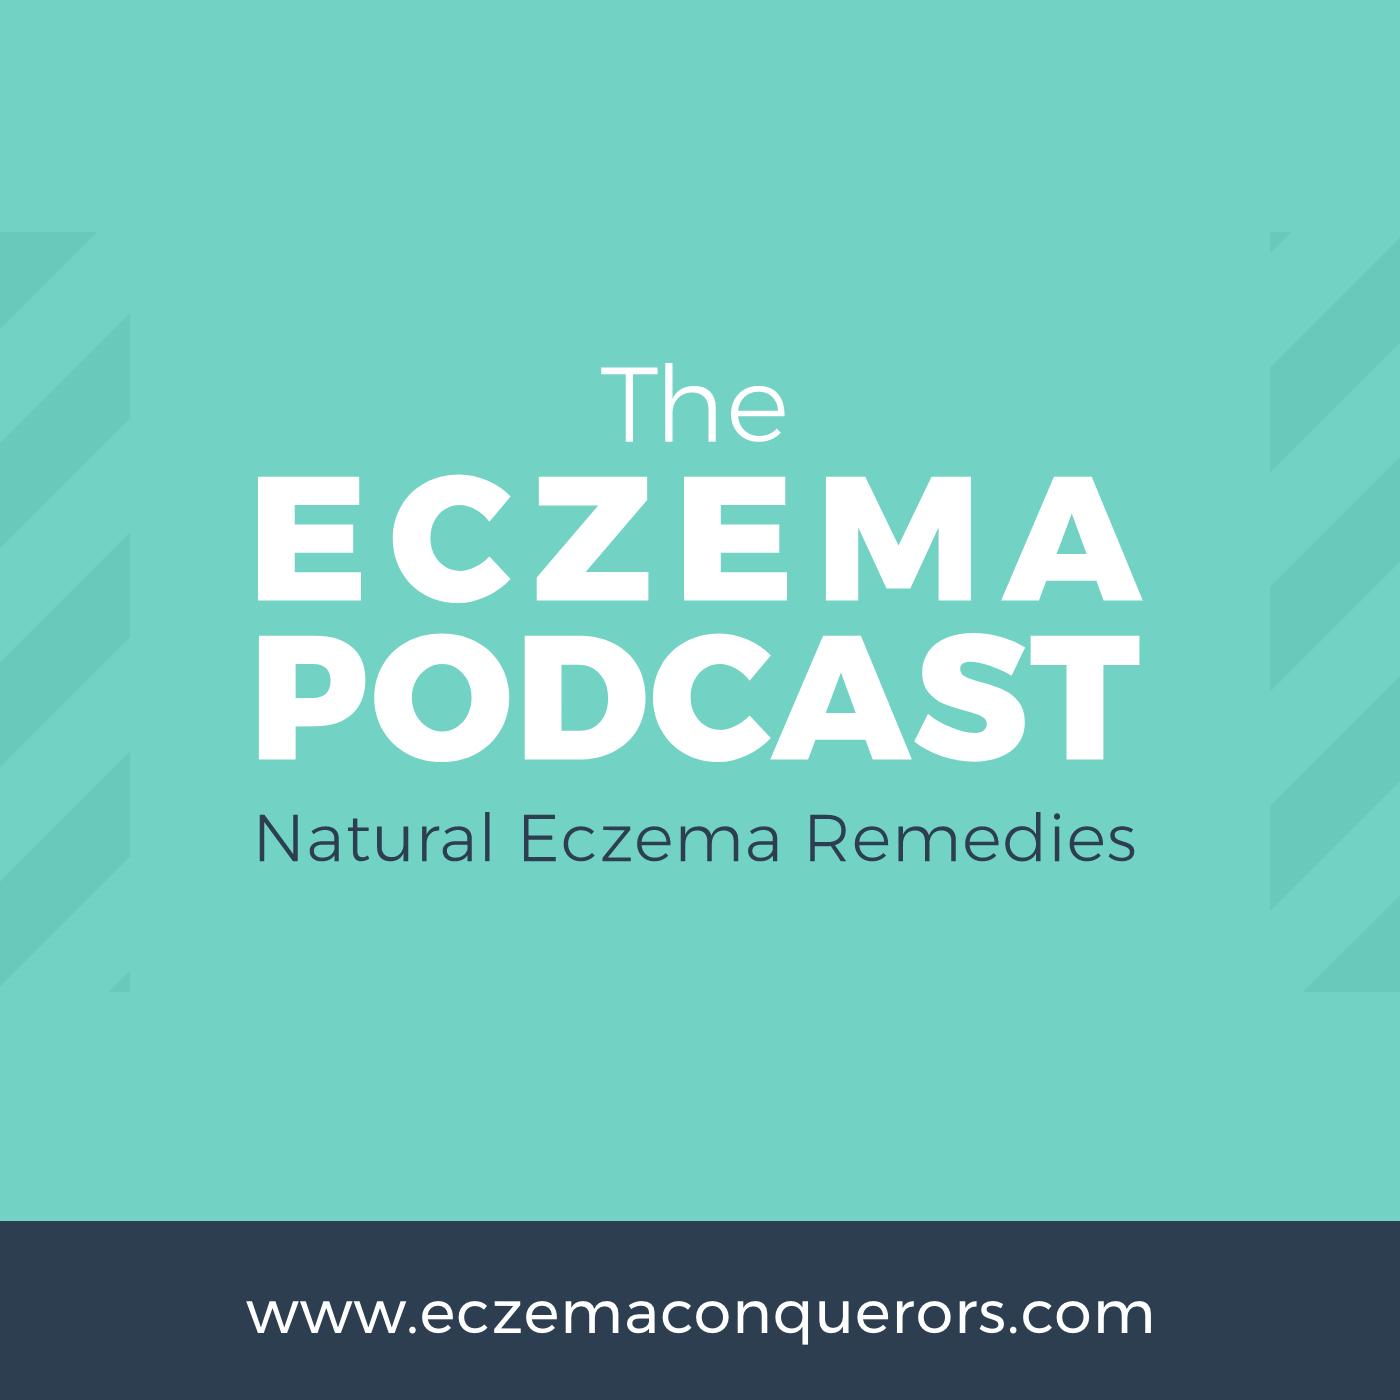 The Eczema Podcast show art